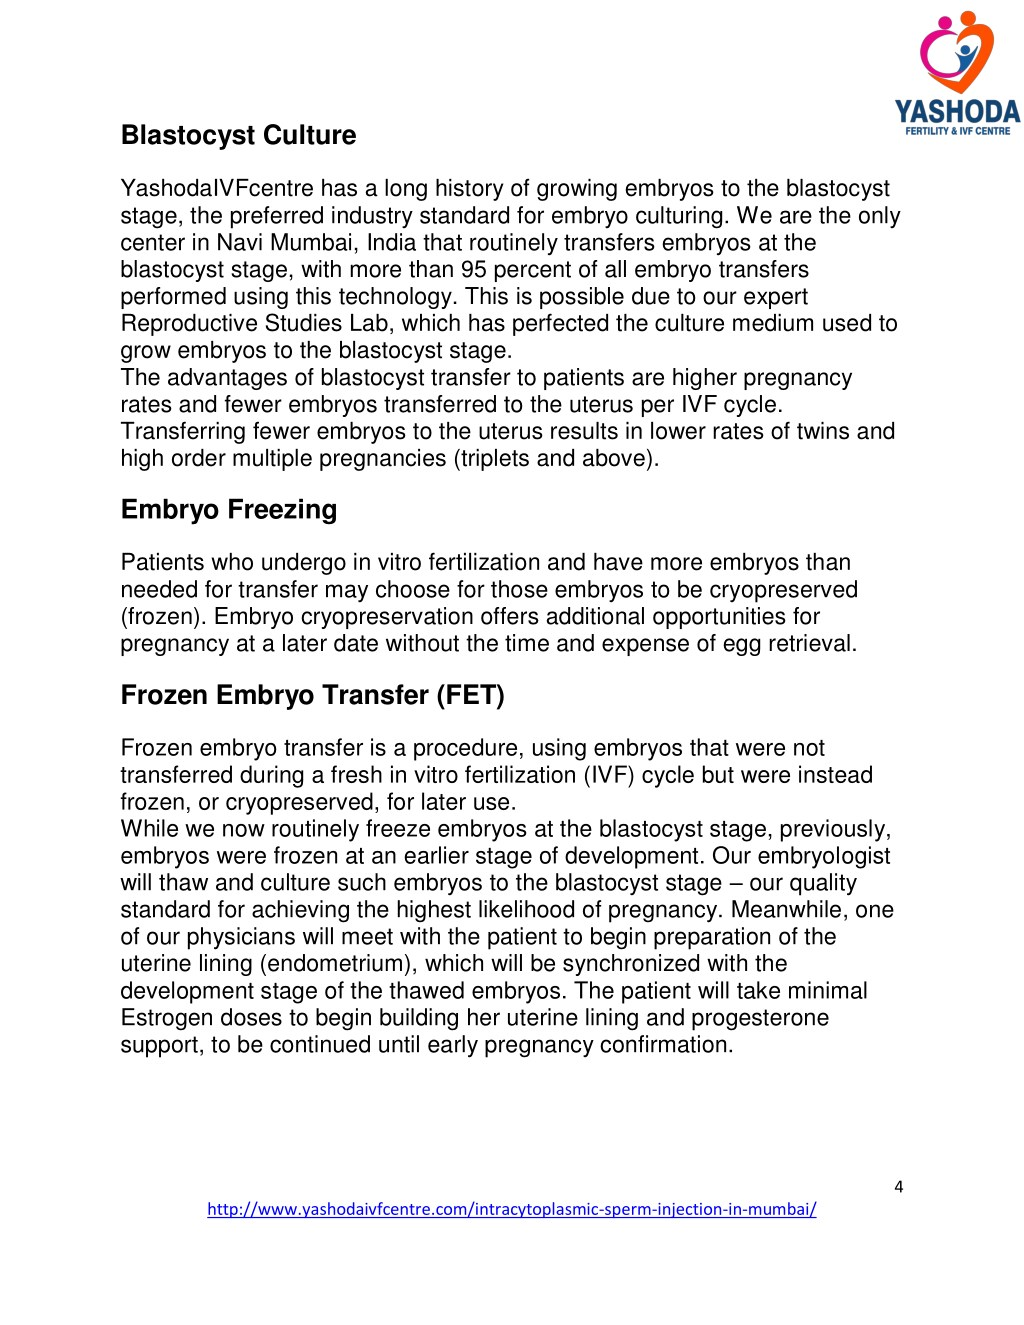 PPT - Advanced Infertility Treatment ICSI,IVF,Egg Donation